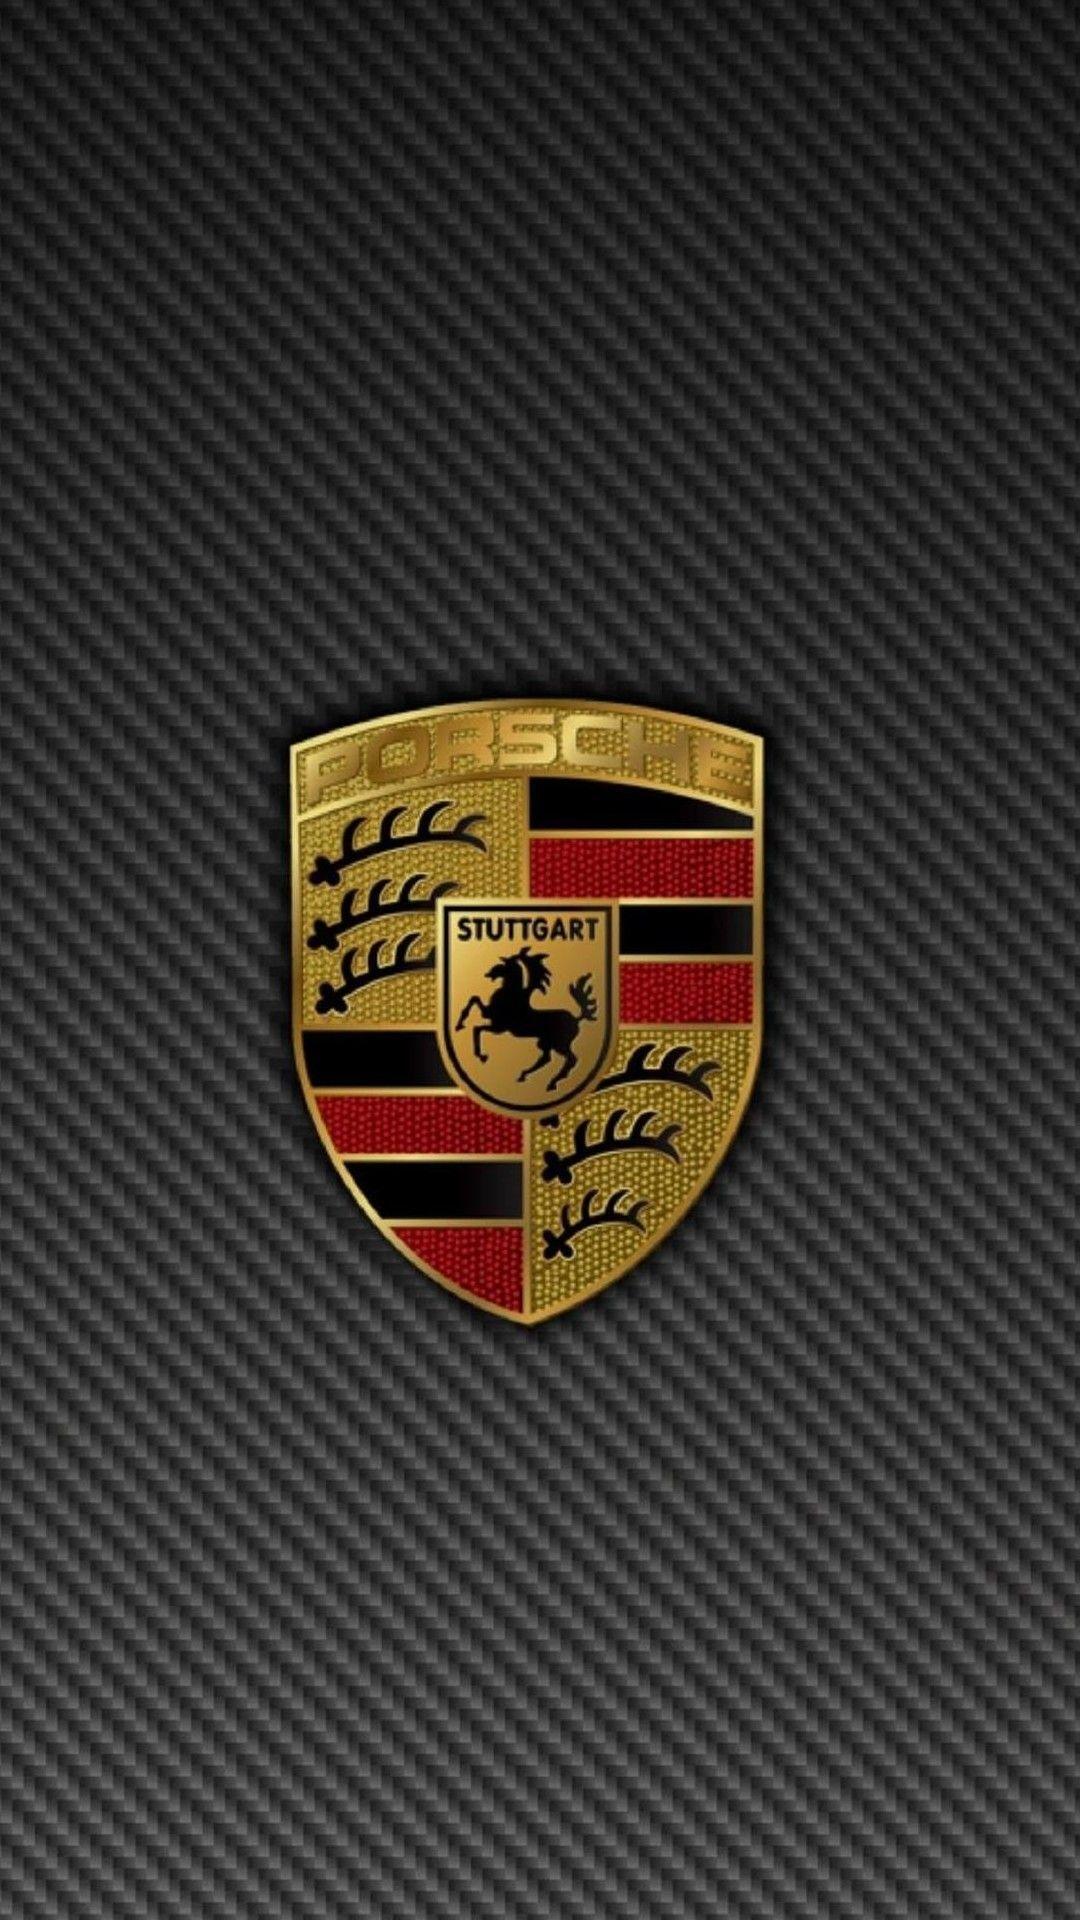 Car Logo Wallpapers Top Free Car Logo Backgrounds Wallpaperaccess